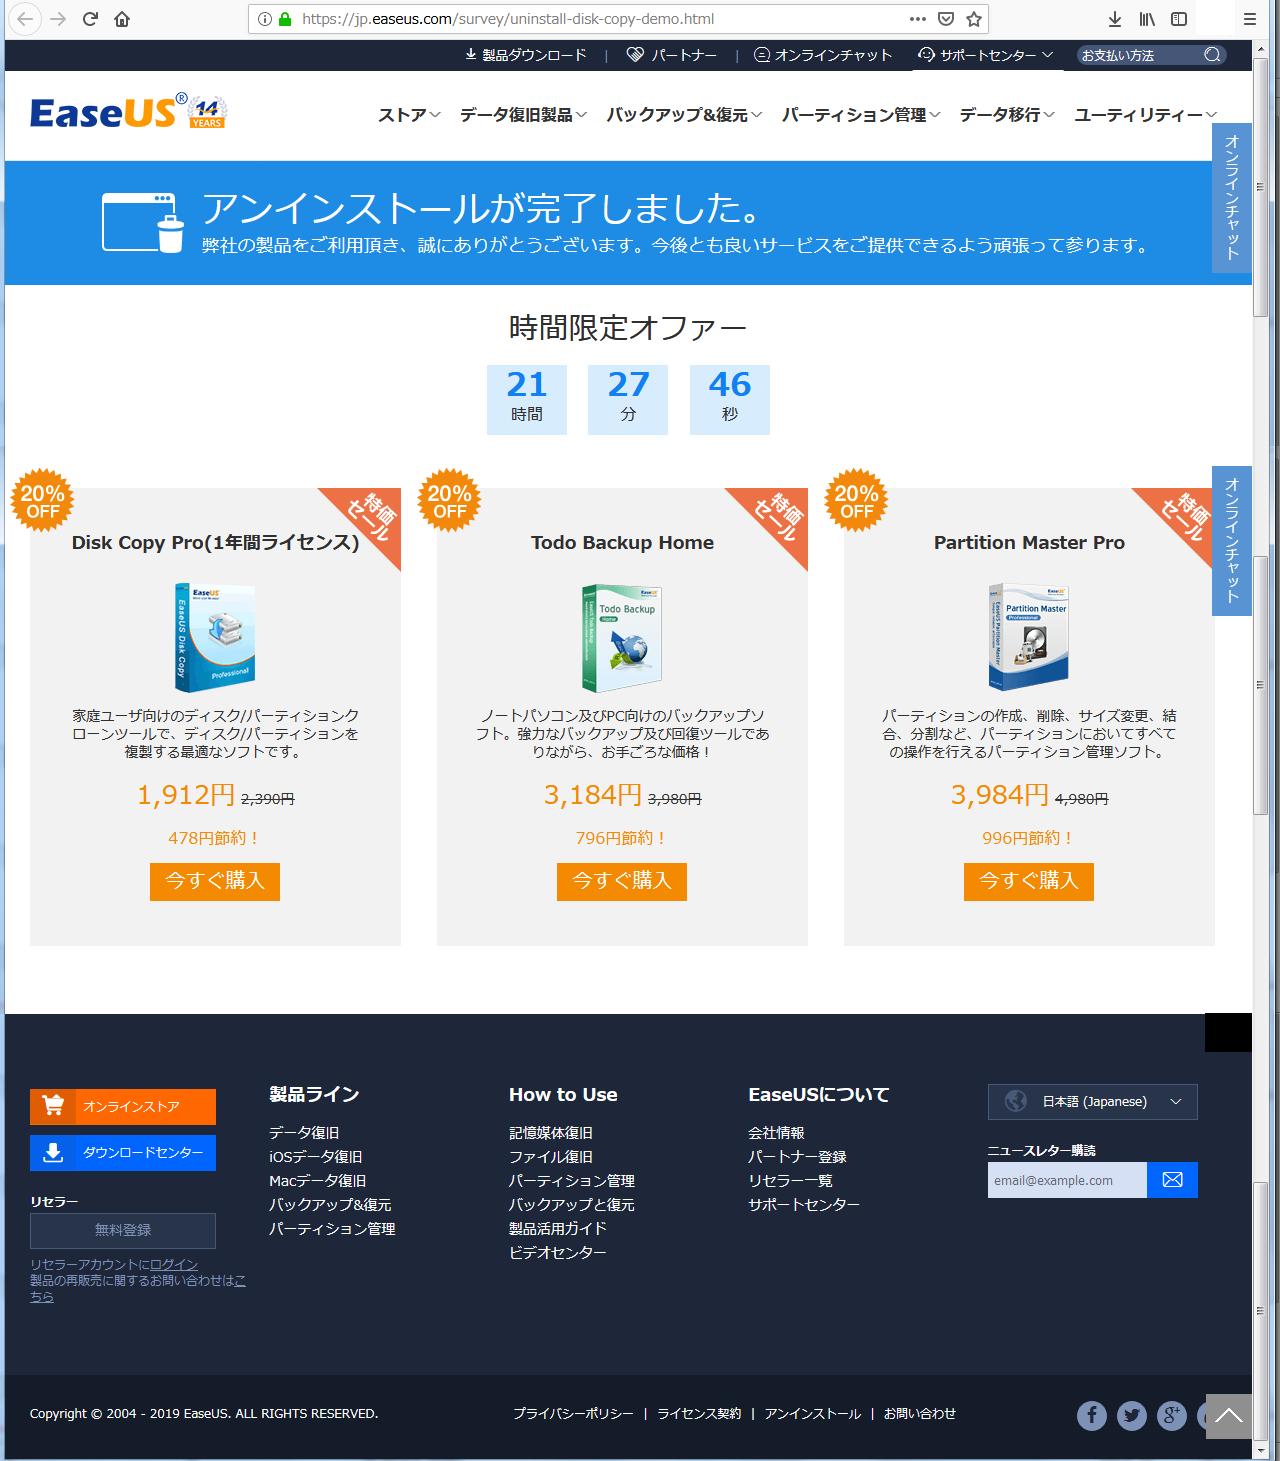 EaseUS Disk Copy Pro 3.0 アンインストール後表示されるページ.png